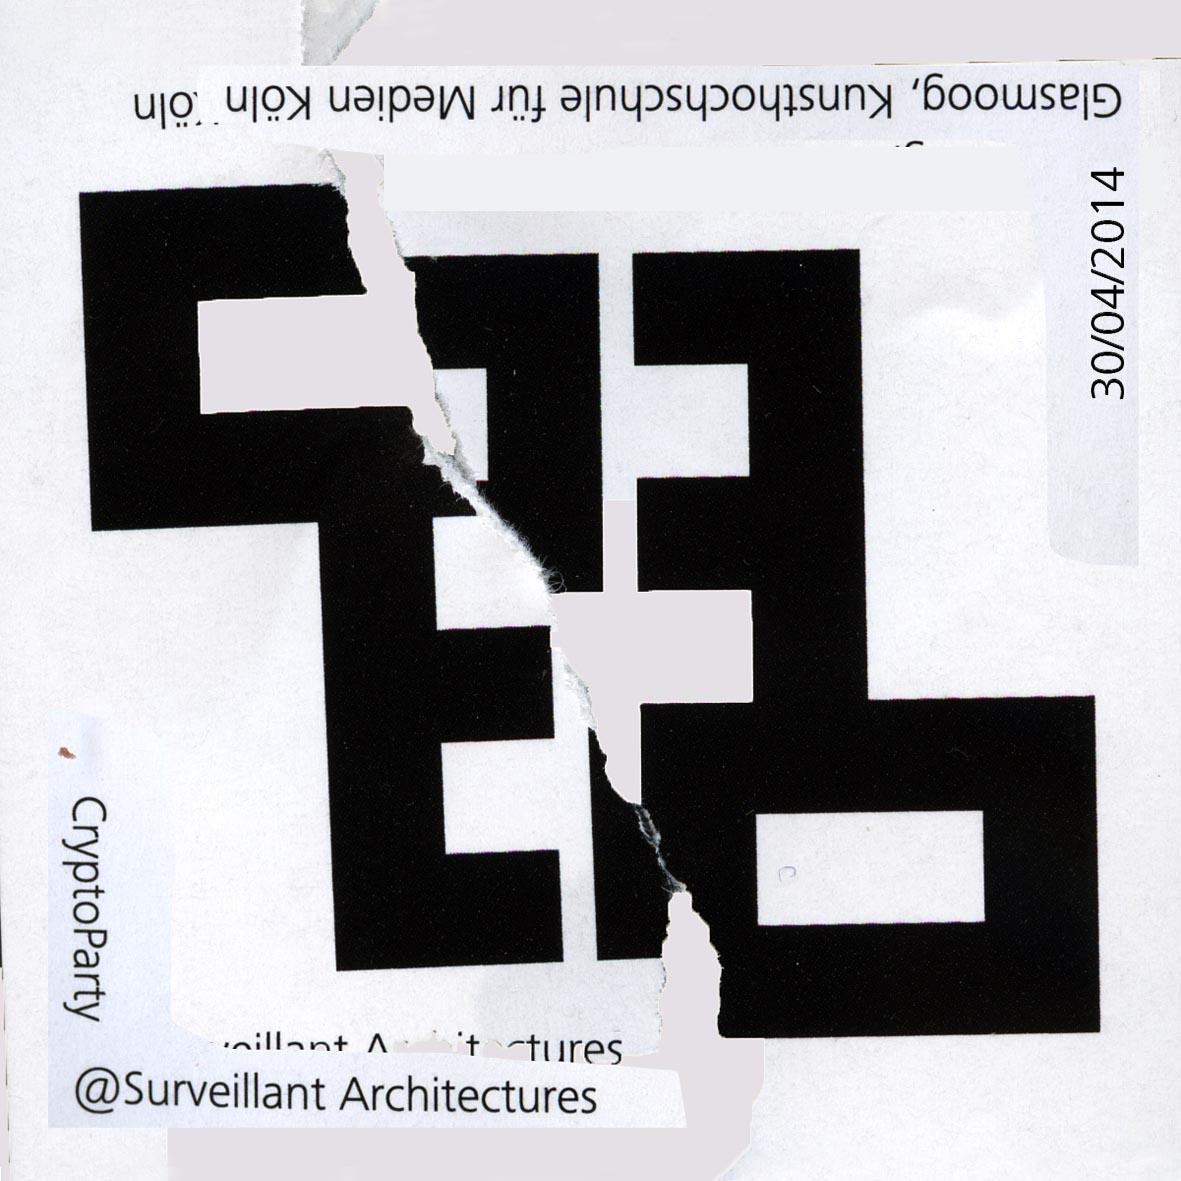 Cryptoparty sticker